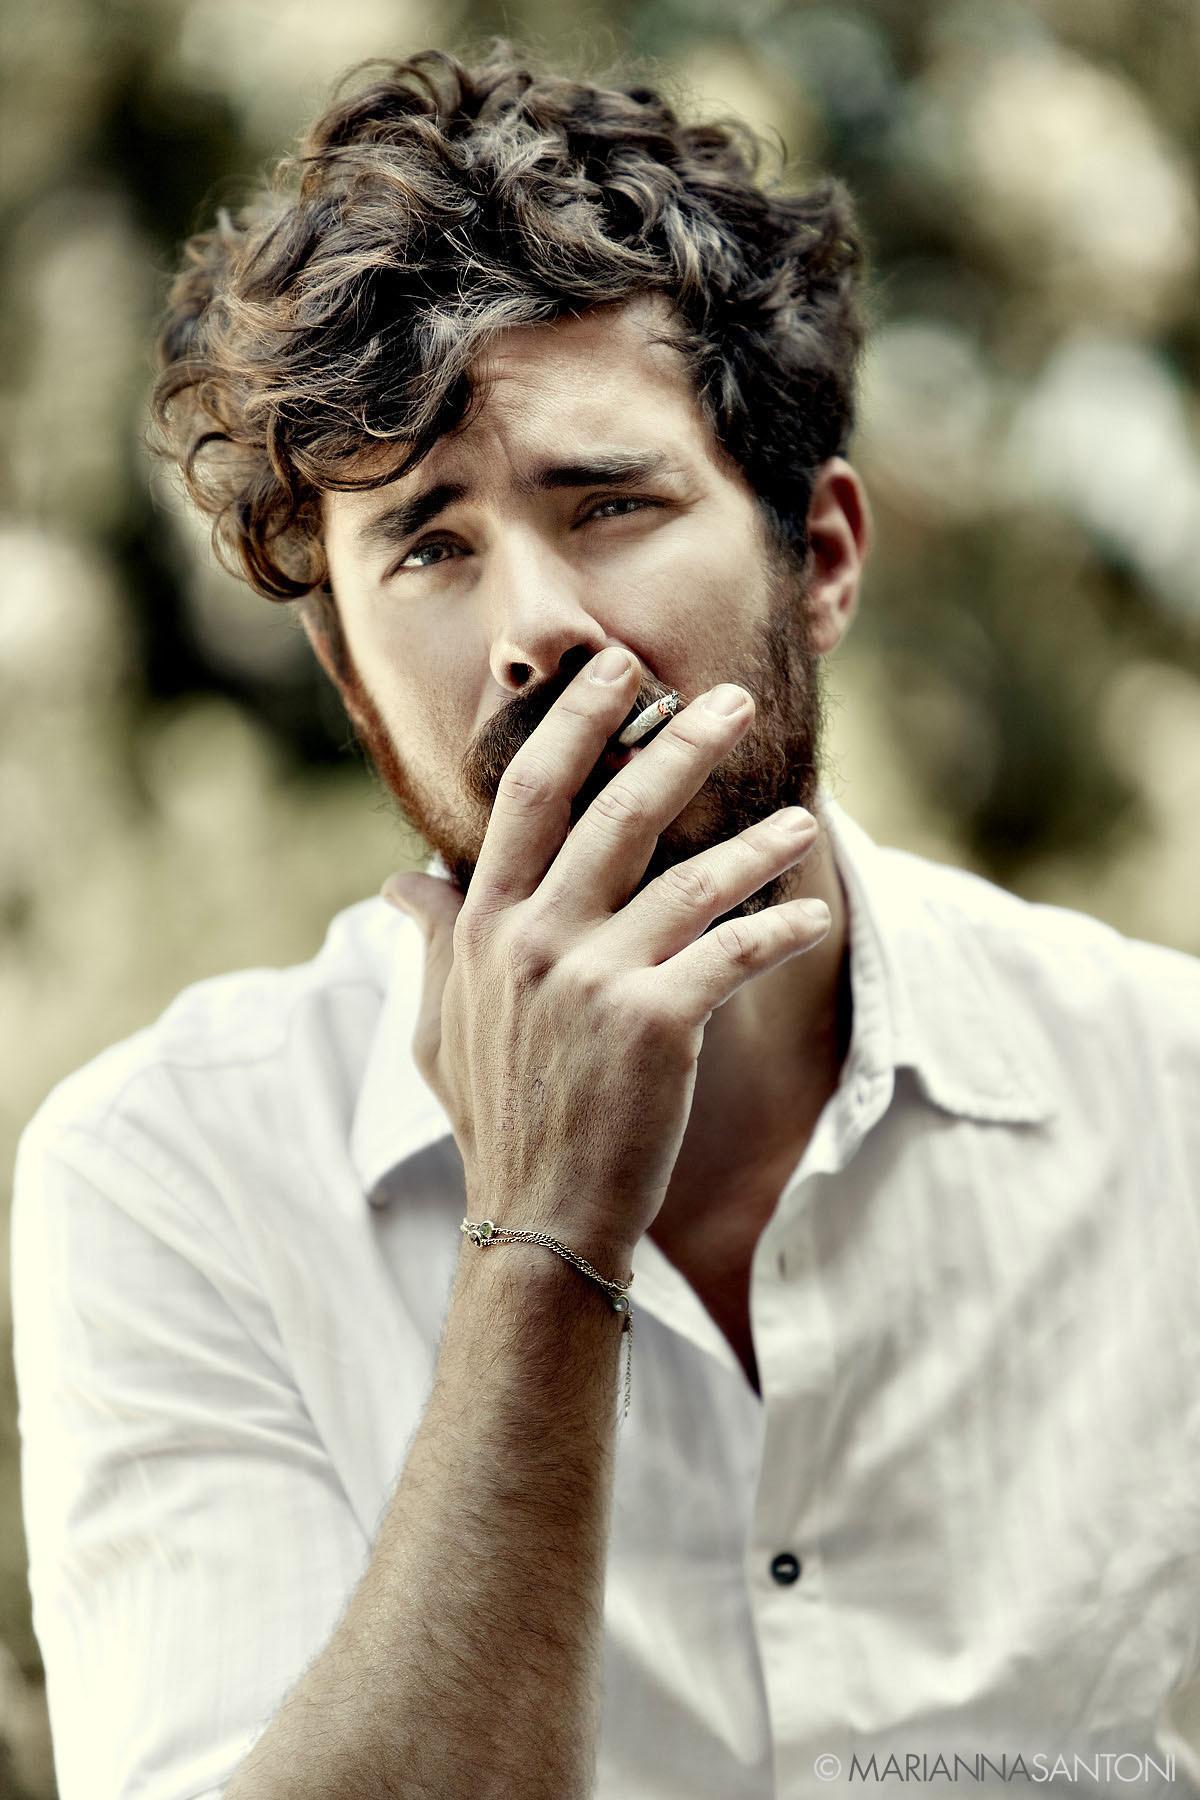 portrait of the singer Lorenzo Kruger (Nobraino) shot by photographer marianna santoni